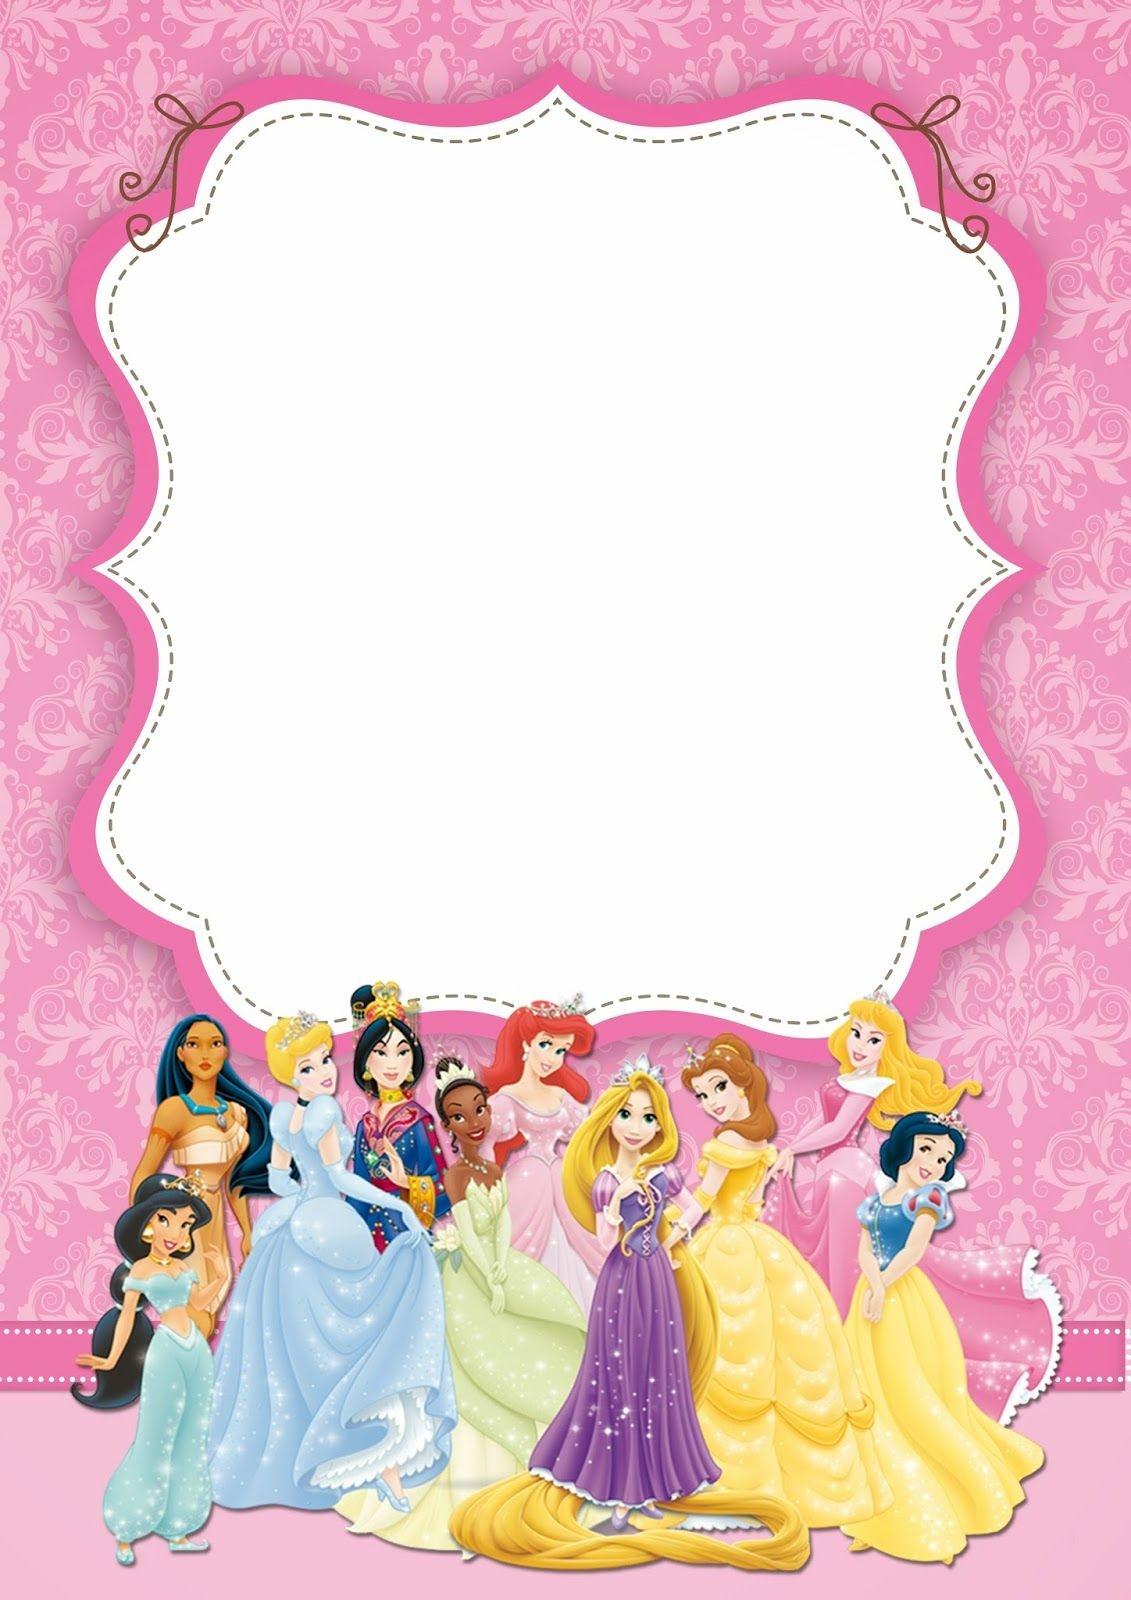 Free Printable Disney Princess Ticket Invitation   Free Printable - Disney Princess Birthday Invitations Free Printable